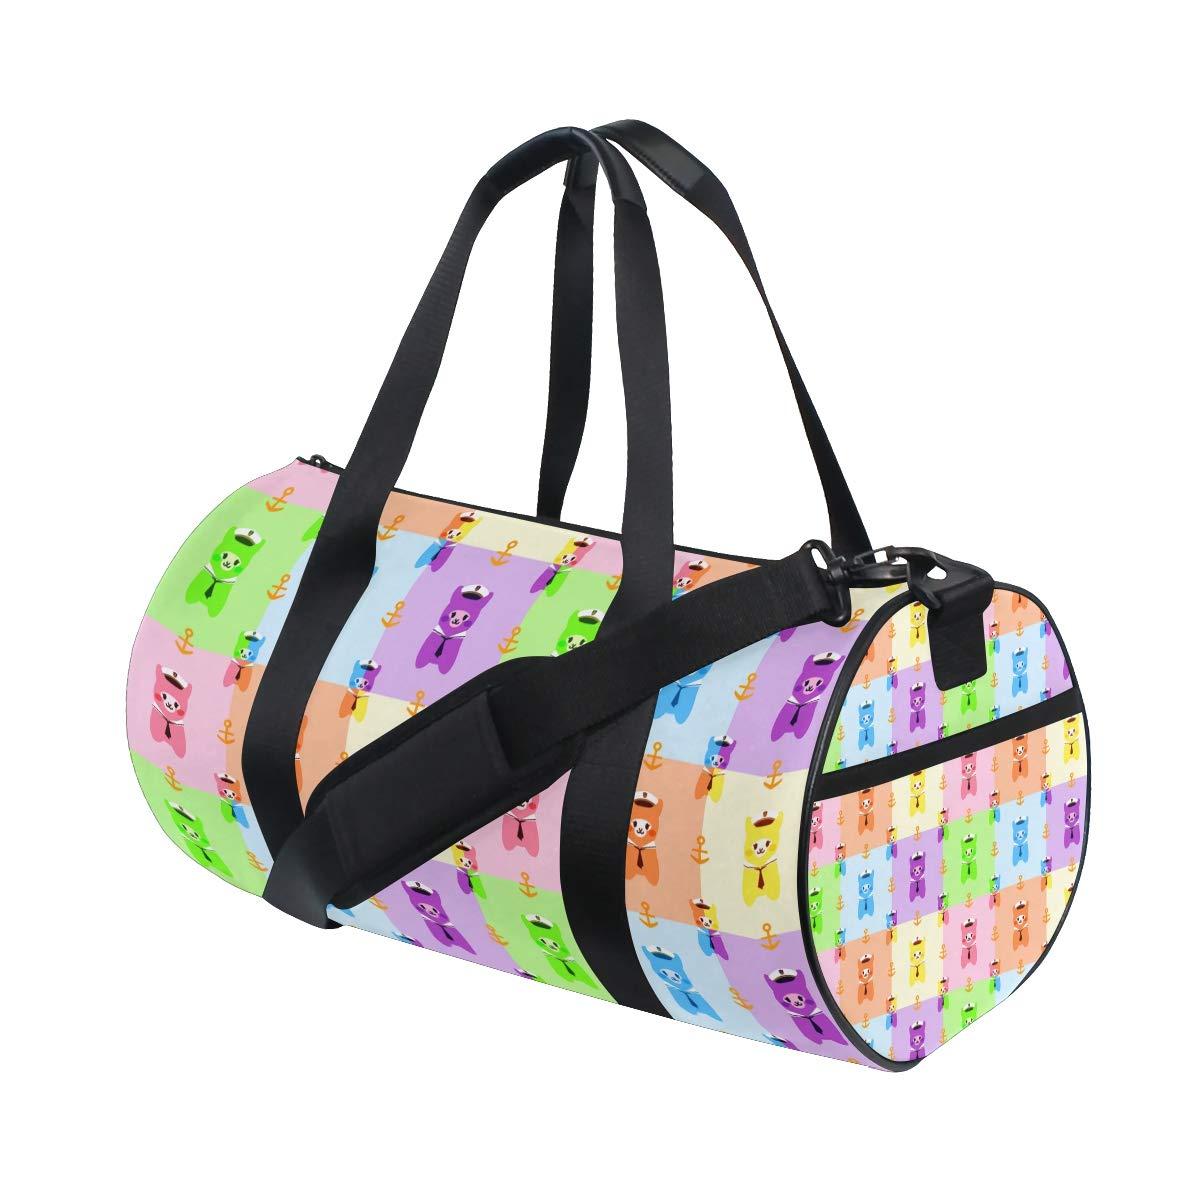 suitable for men and women. Captain AlpacasPopular casual fitness bag sports bag non-slip wearable handbag crossbody bag